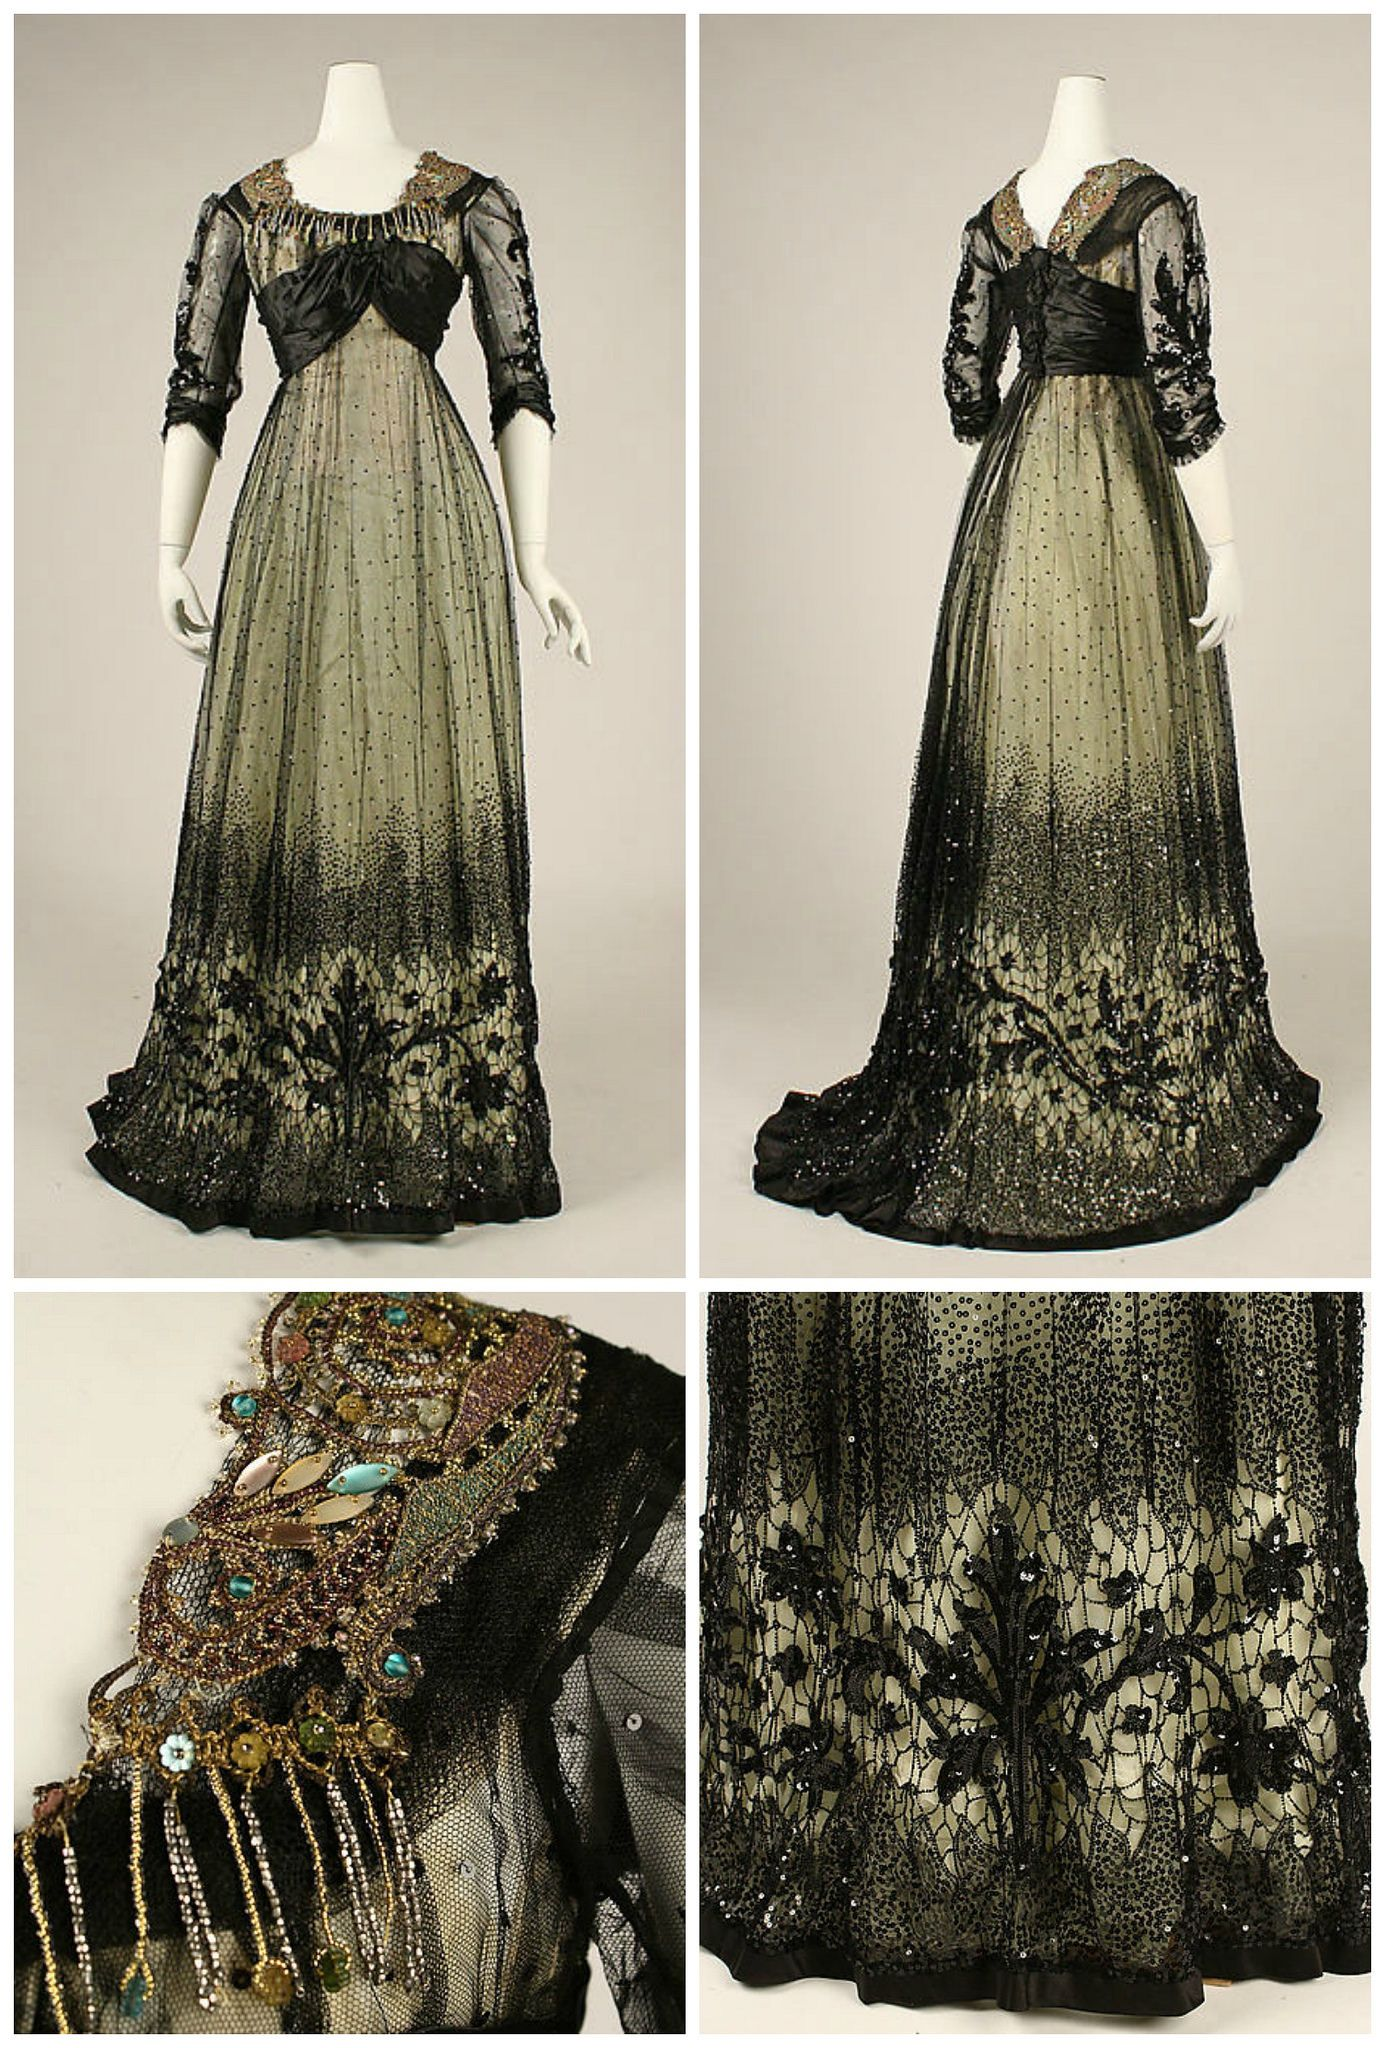 1908 Ball Gown American Silk Cotton Glass Metallic Thread Metmuseum Ball Gowns Victorian Ball Gowns Edwardian Ball Gown [ 2048 x 1385 Pixel ]